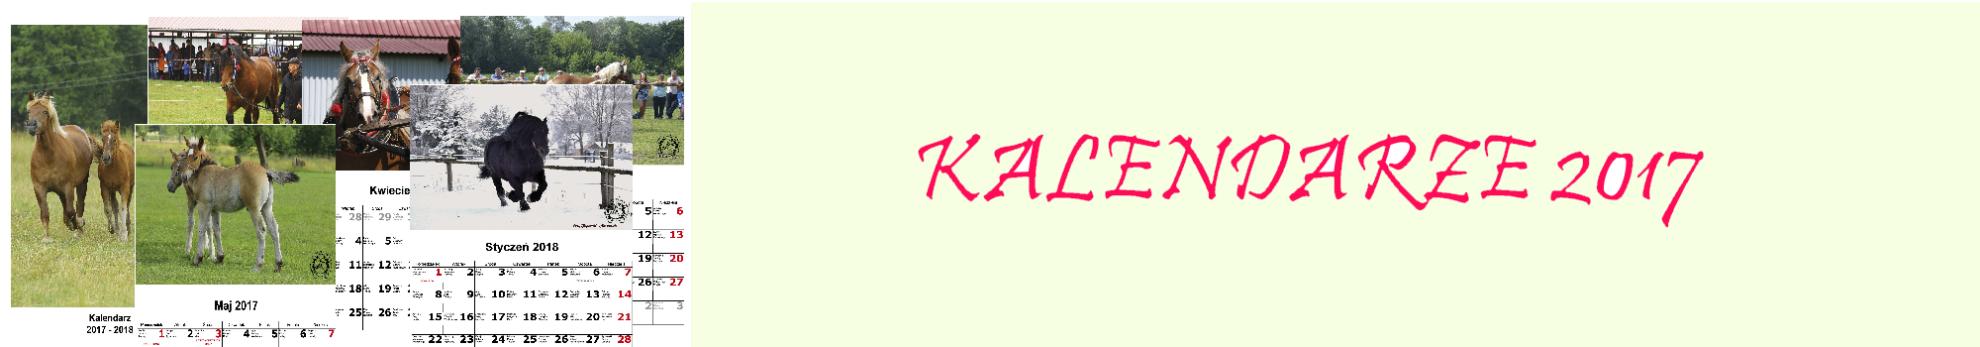 kal_baner1